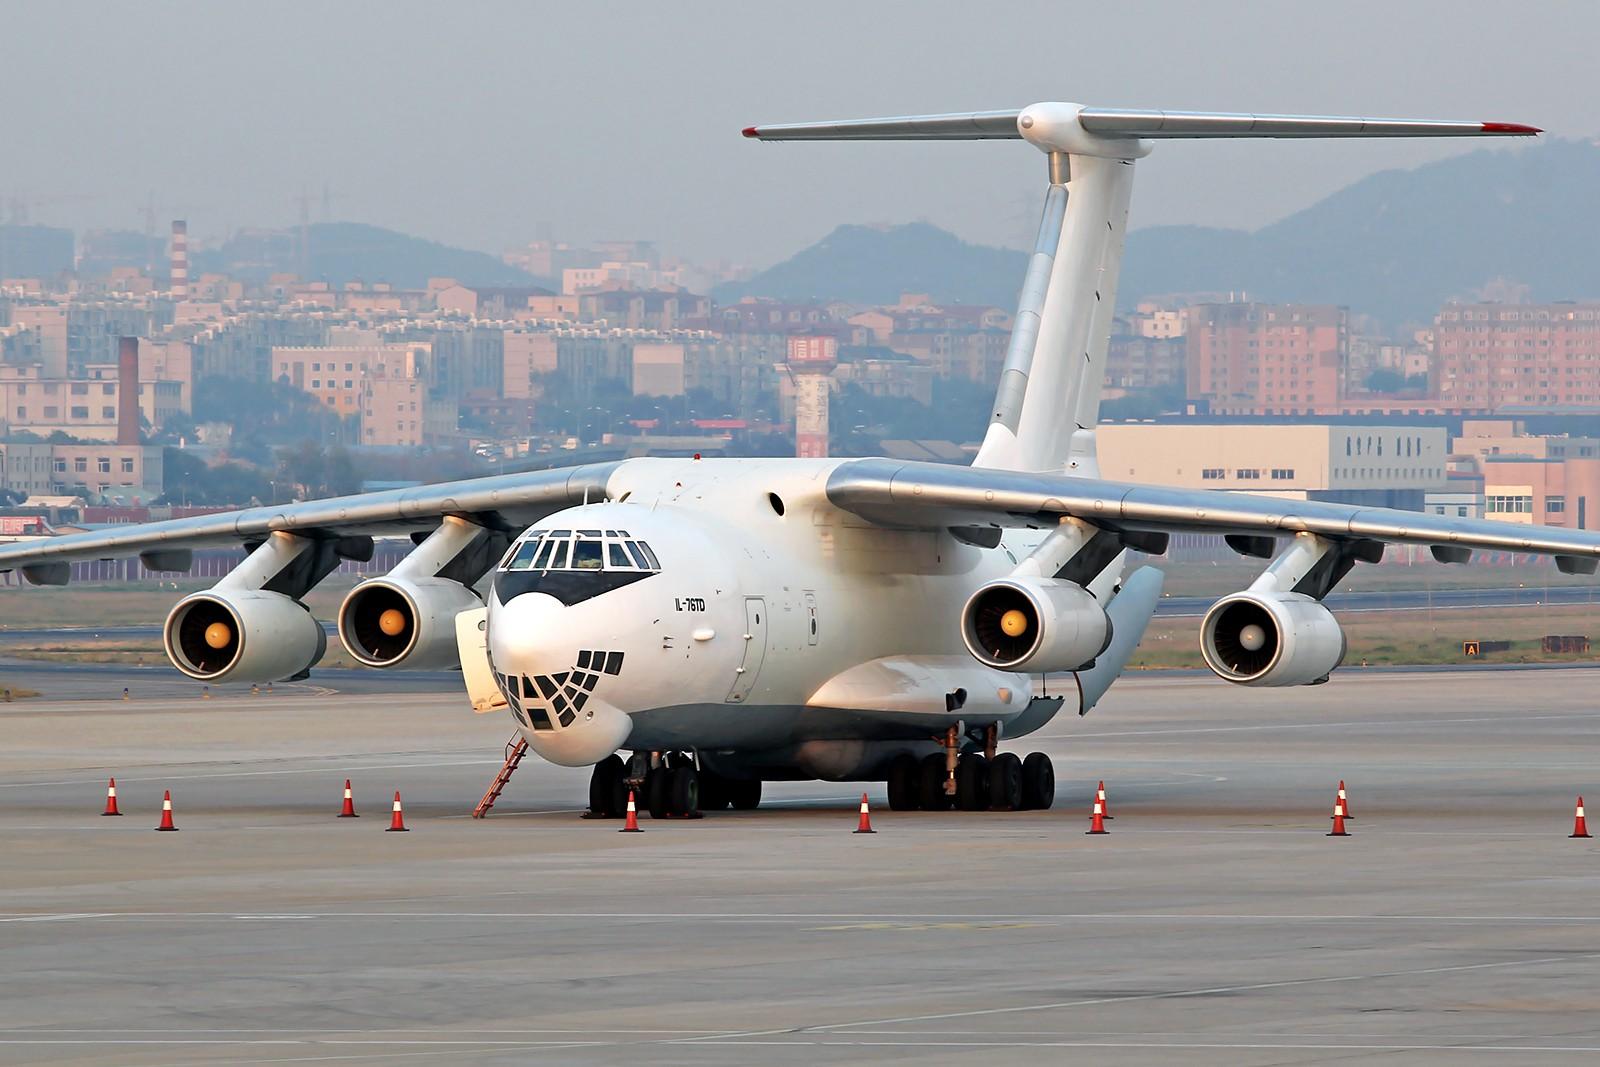 Re:[原创][DLC]。。。俄罗斯第二架RA-76834 IL-76TD,第一架RA-76834 IL-76TD于1997.01.25坠毁。。。 ILYUSHIN IL-76-TD RA-76834 中国大连国际机场